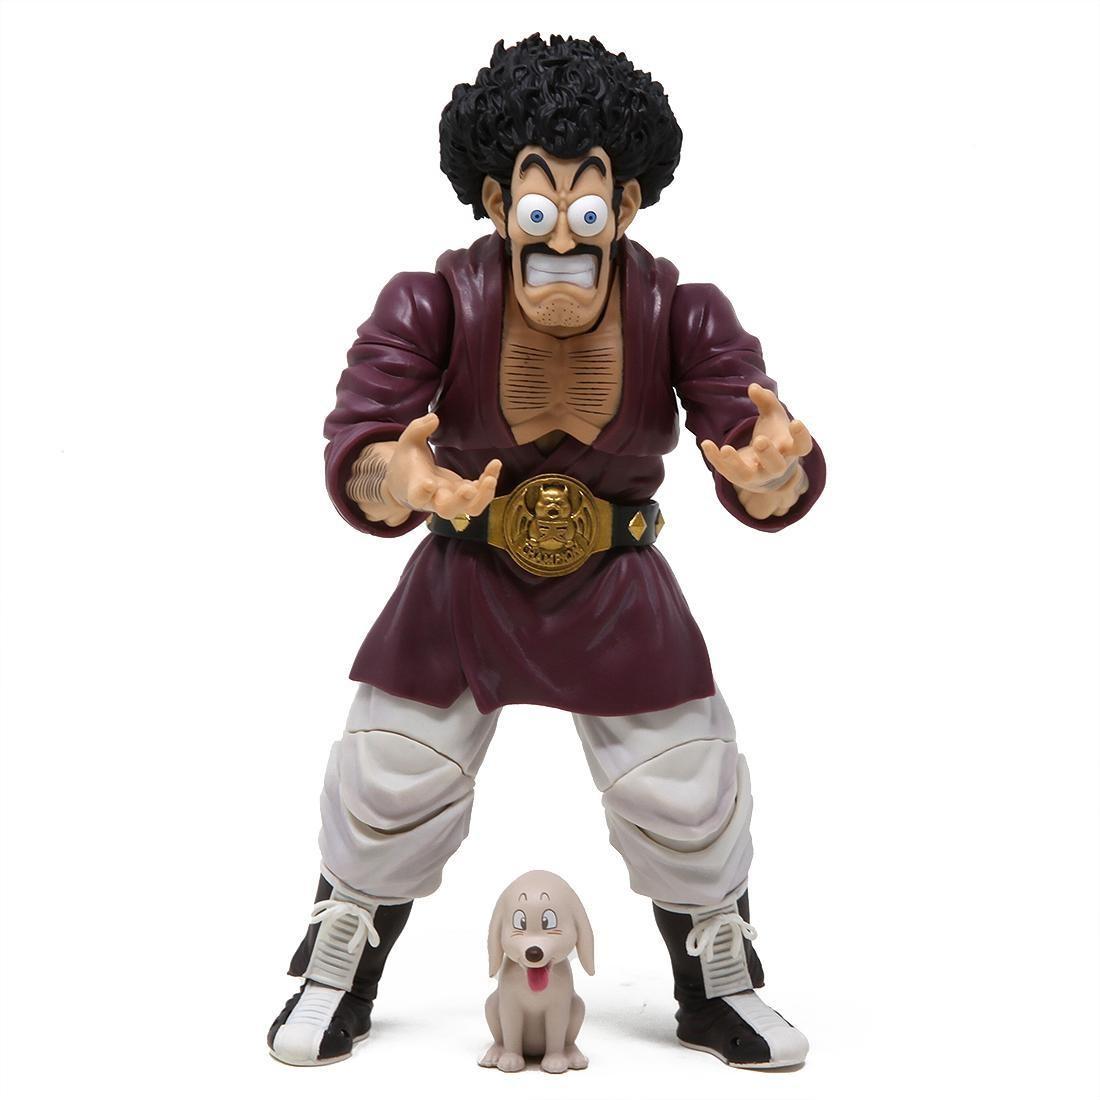 Bandai S.H.Figuarts Dragon Ball Z Mr. Satan Figure (burgundy)